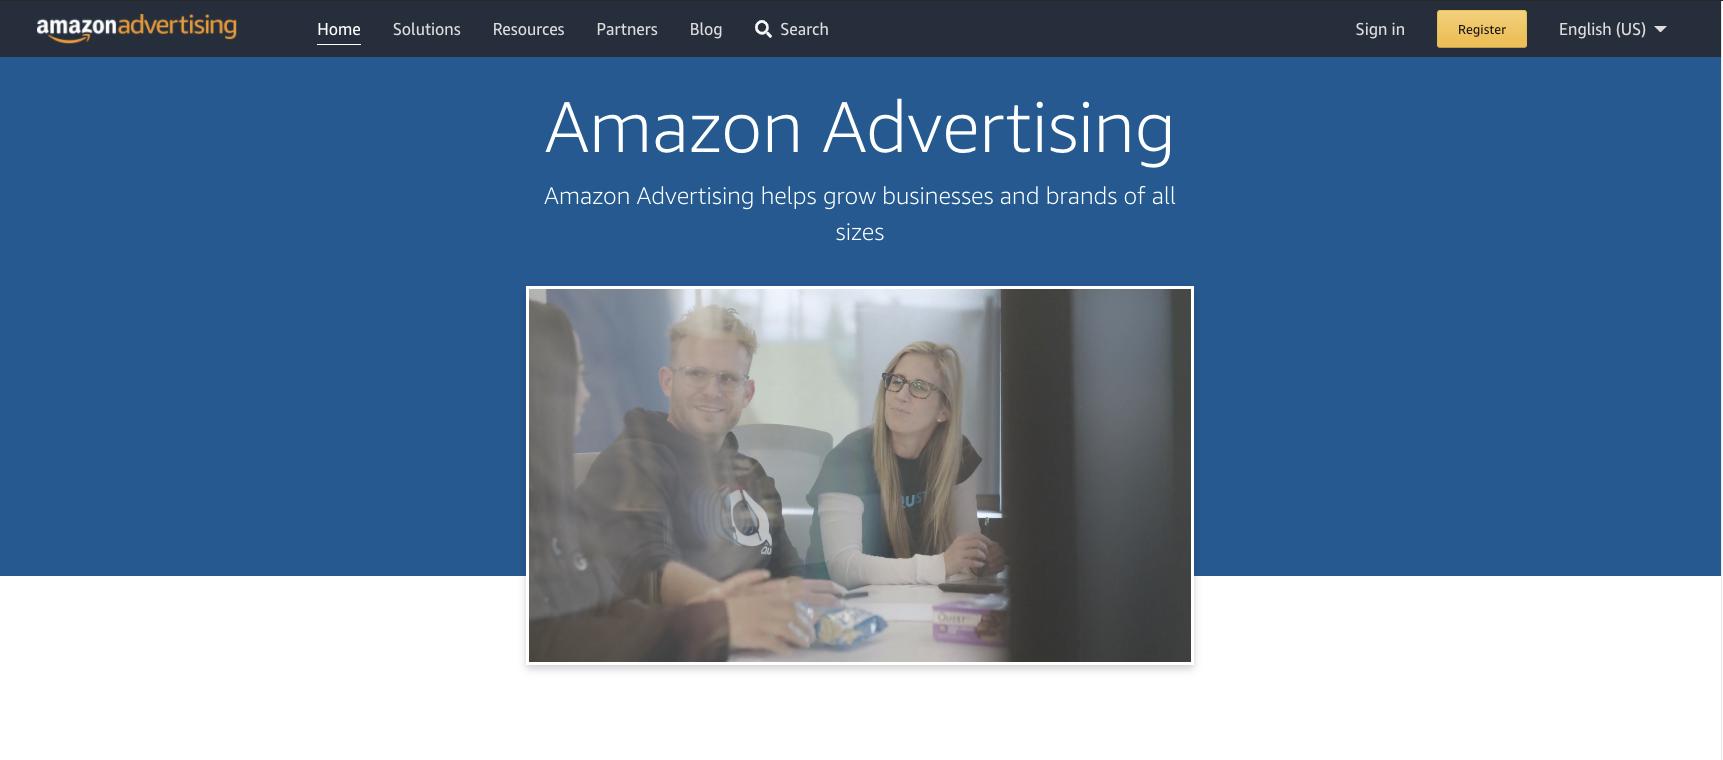 Amazon Advertising Service